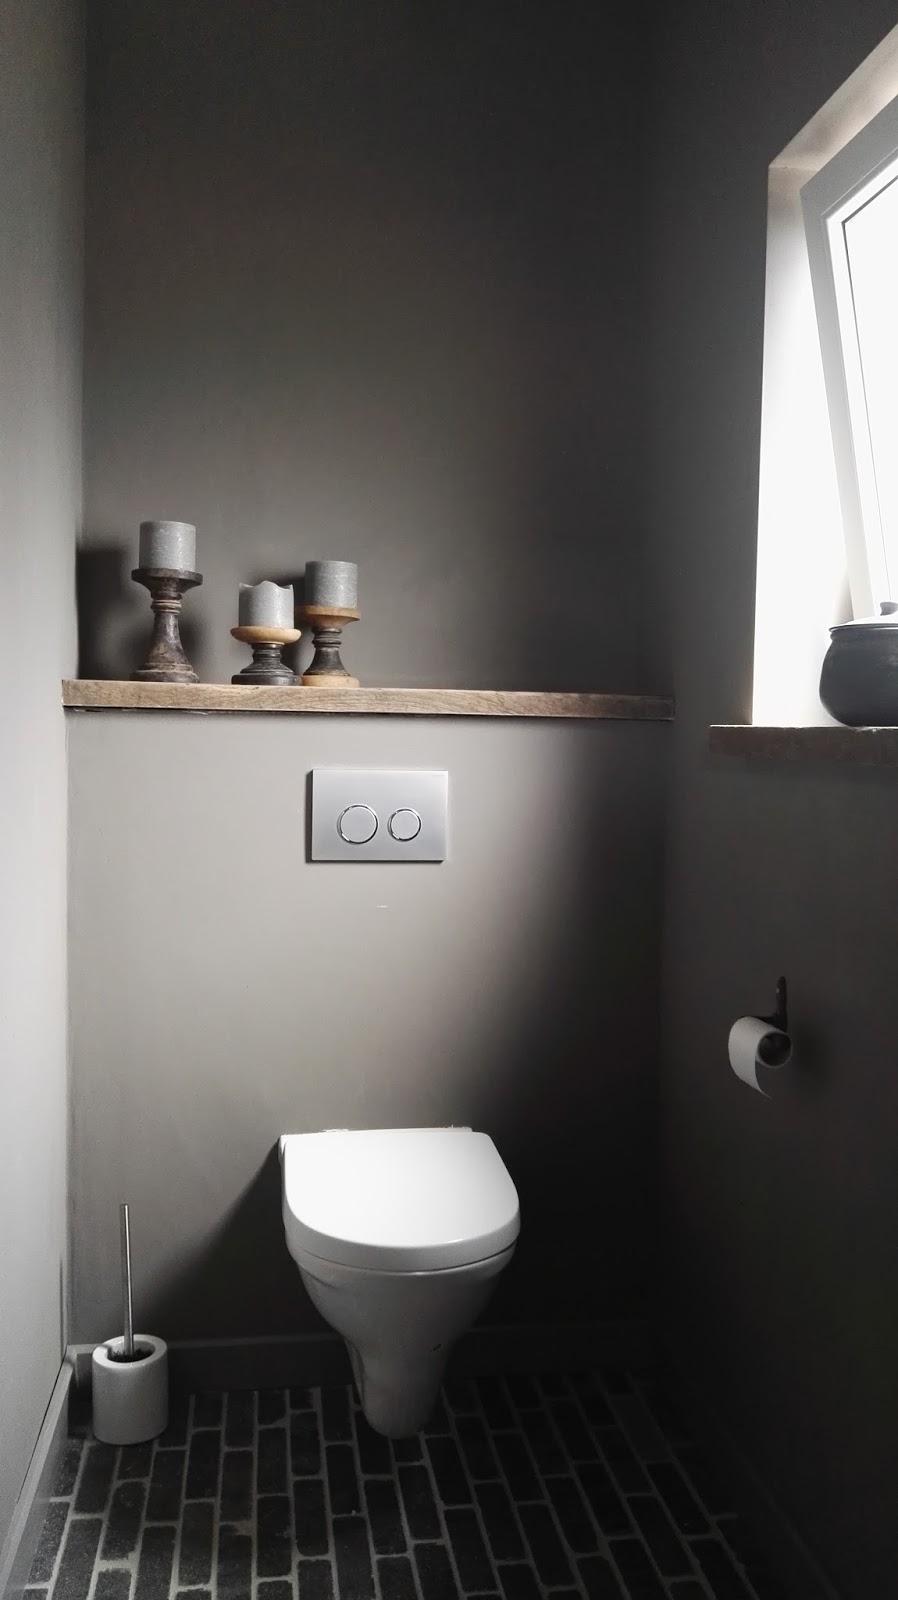 8 x 4 badezimmer designs patricia romanelli patriz on pinterest